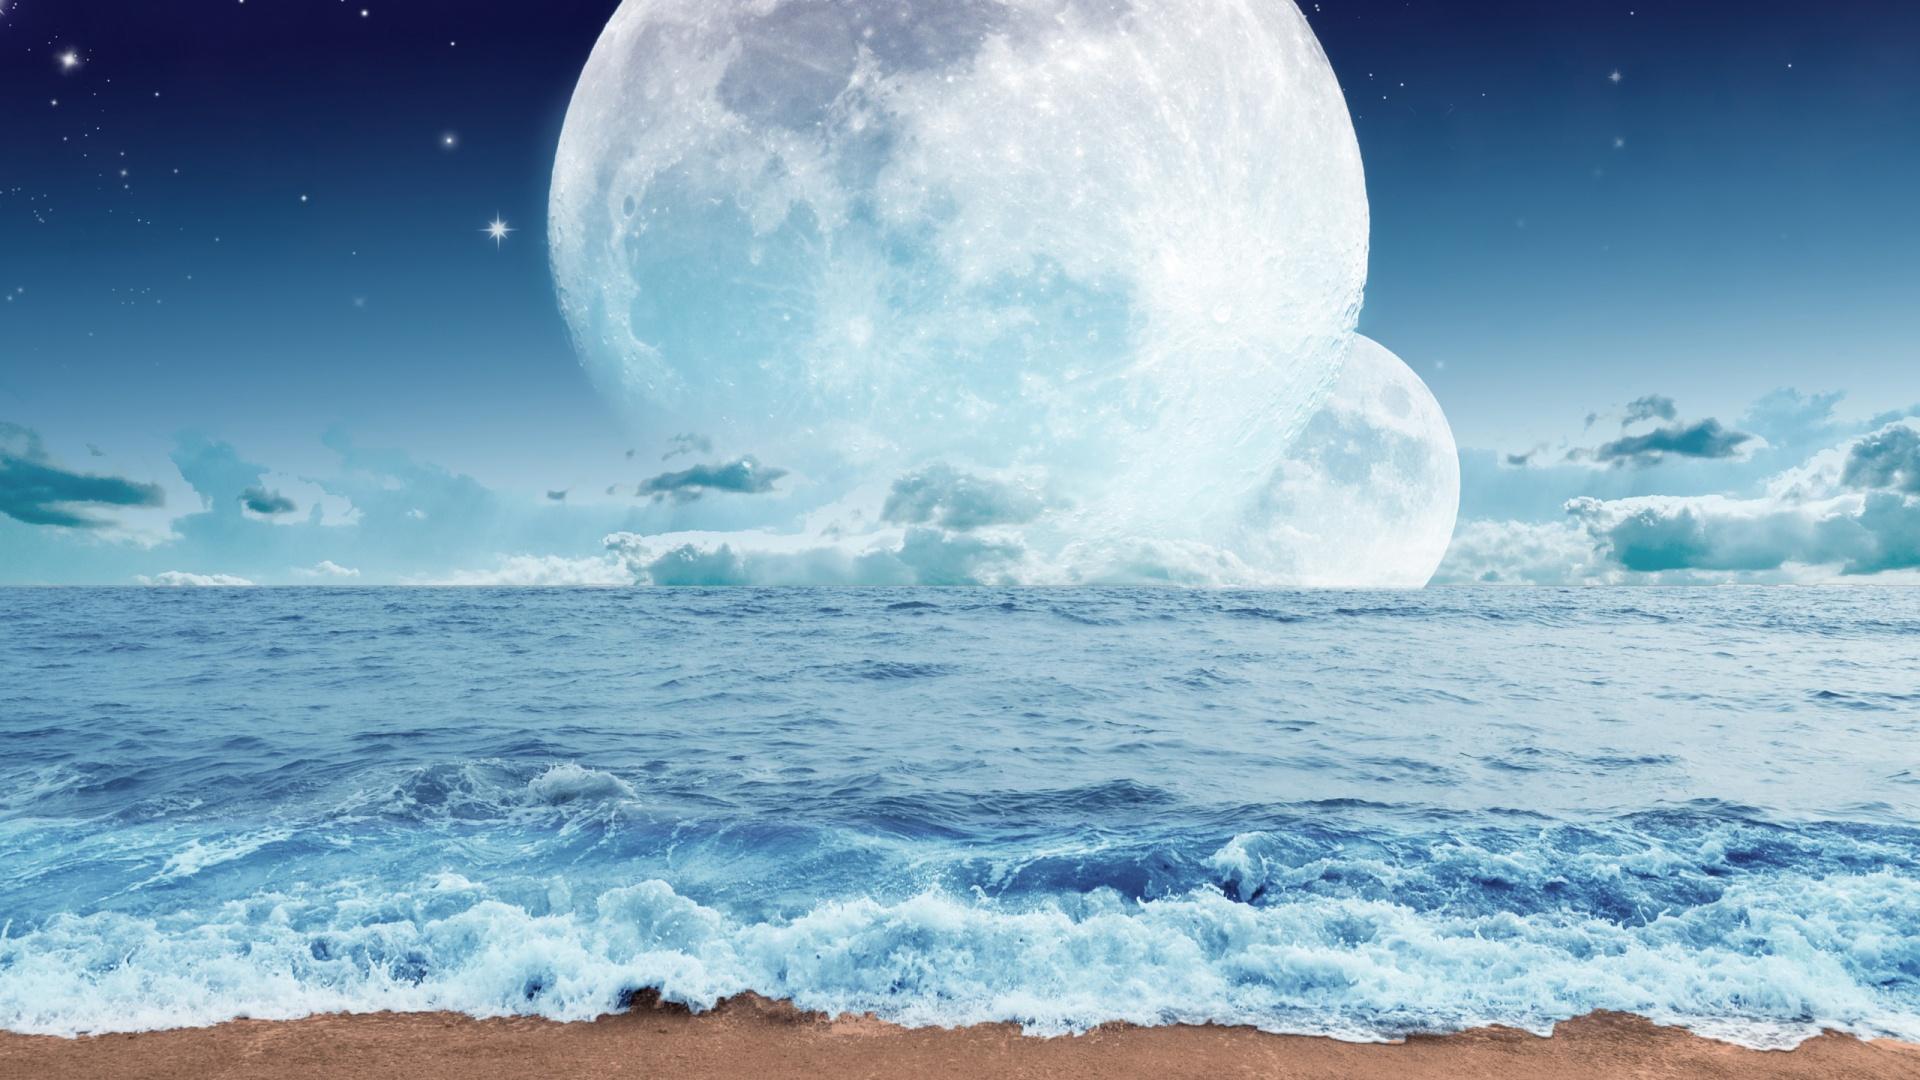 Тапети за десктоп с море